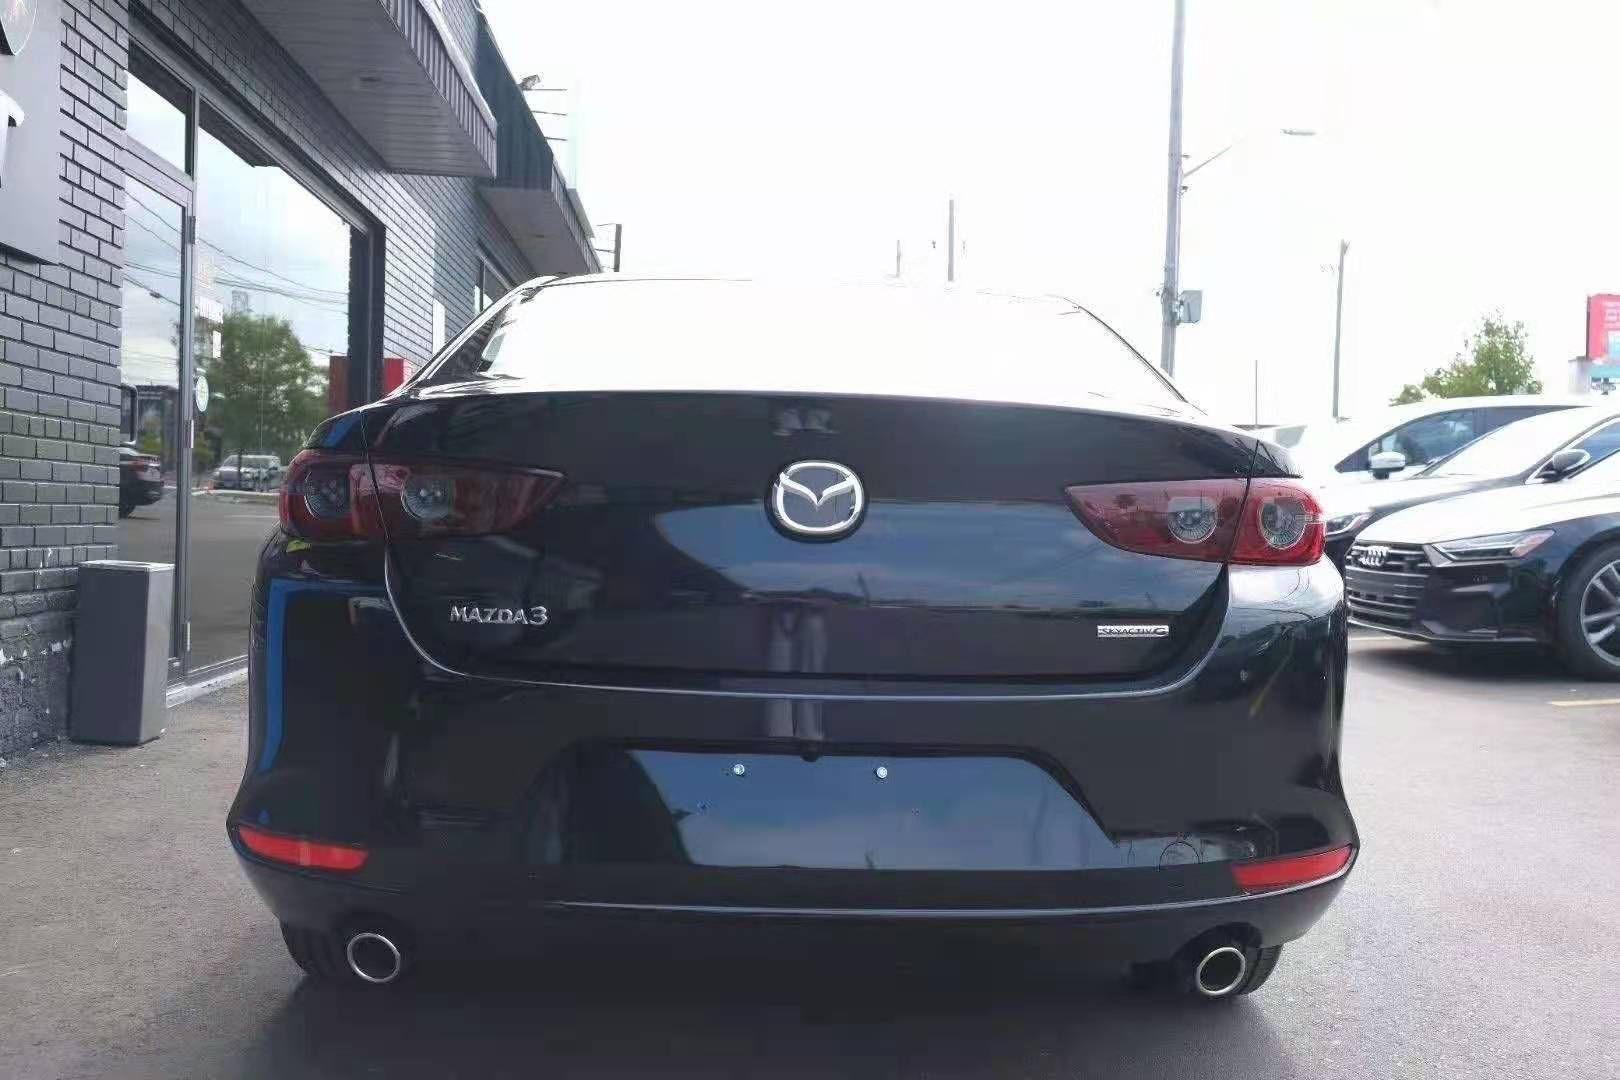 2020 Mazda MAZDA3 GX AT - INFOCAR - Toronto's Most Comprehensive New and Used Auto Trading Platform